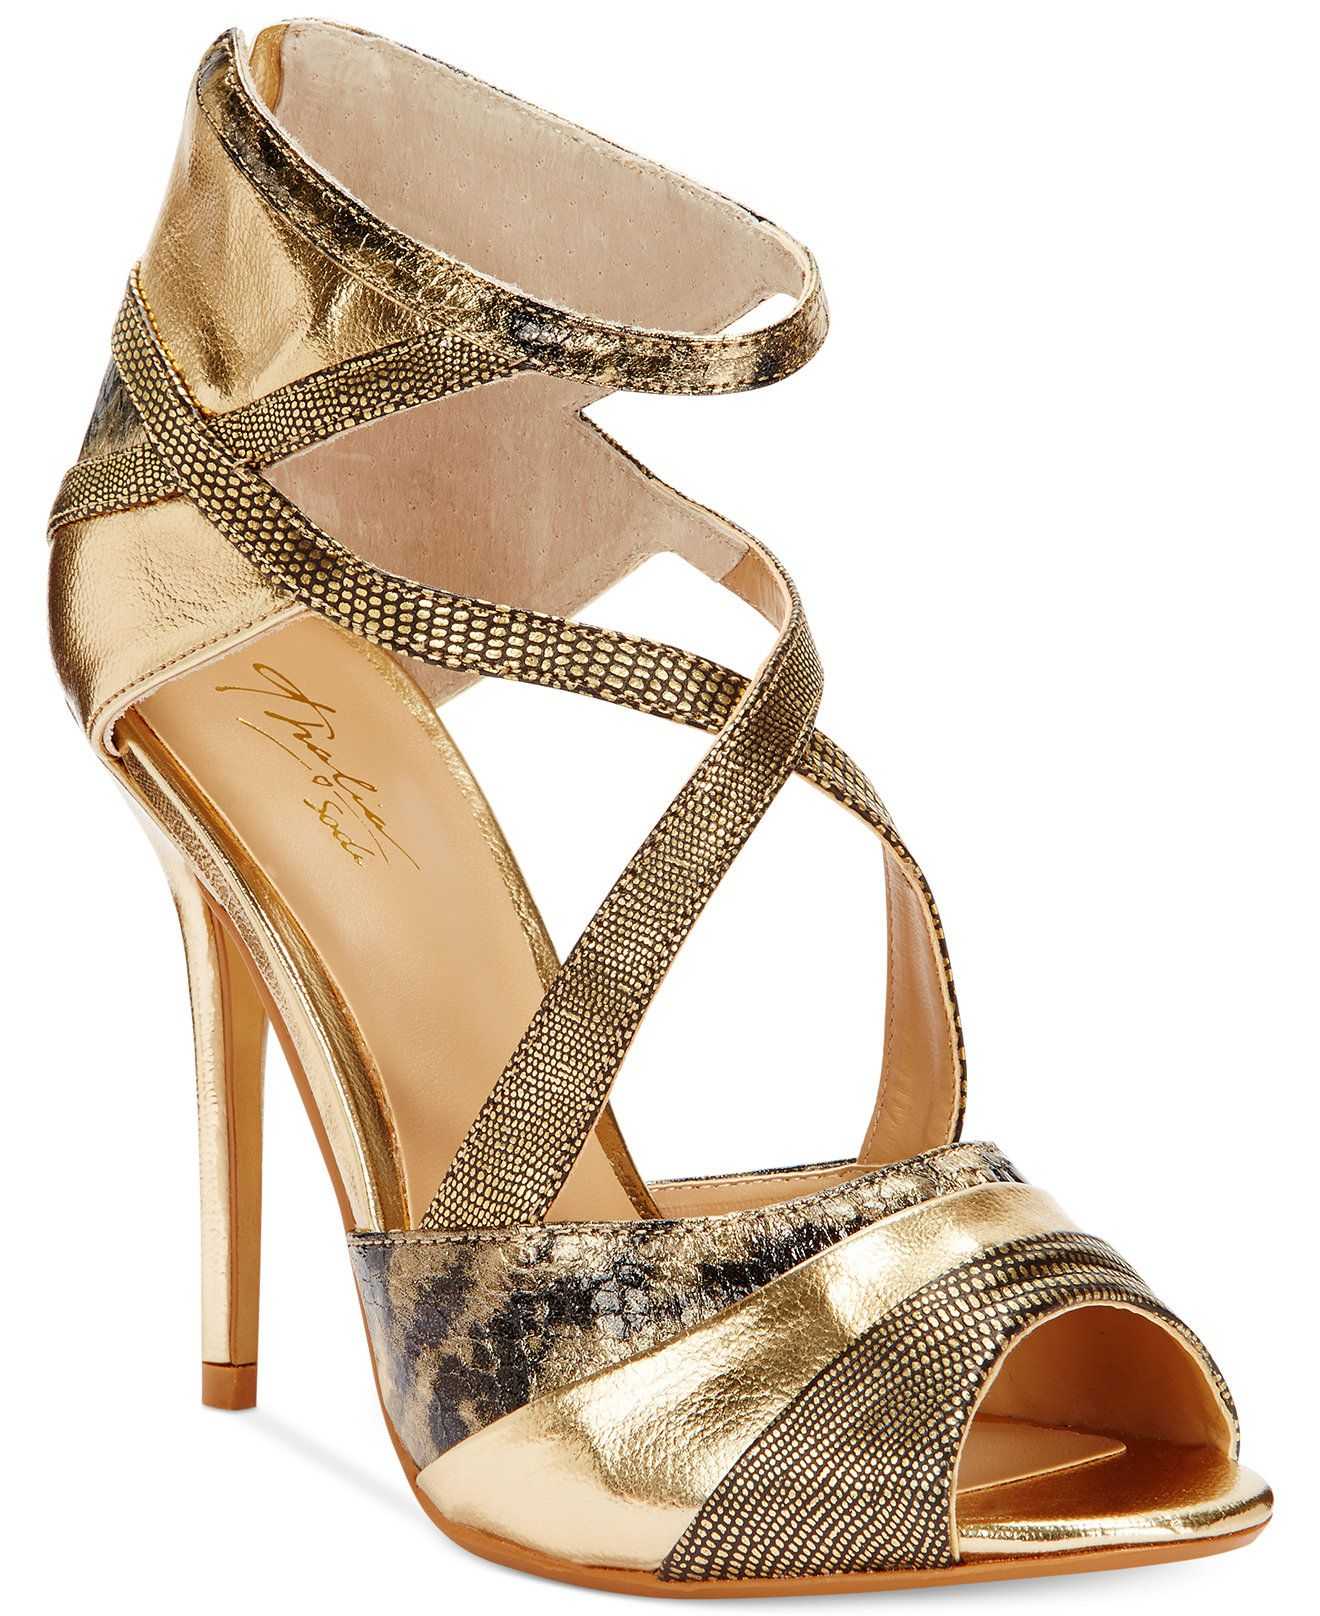 2356cc6246 Thalia Sodi Women's Ximena Strappy High Heel Dress Sandals - Evening &  Bridal - Shoes - Macy's